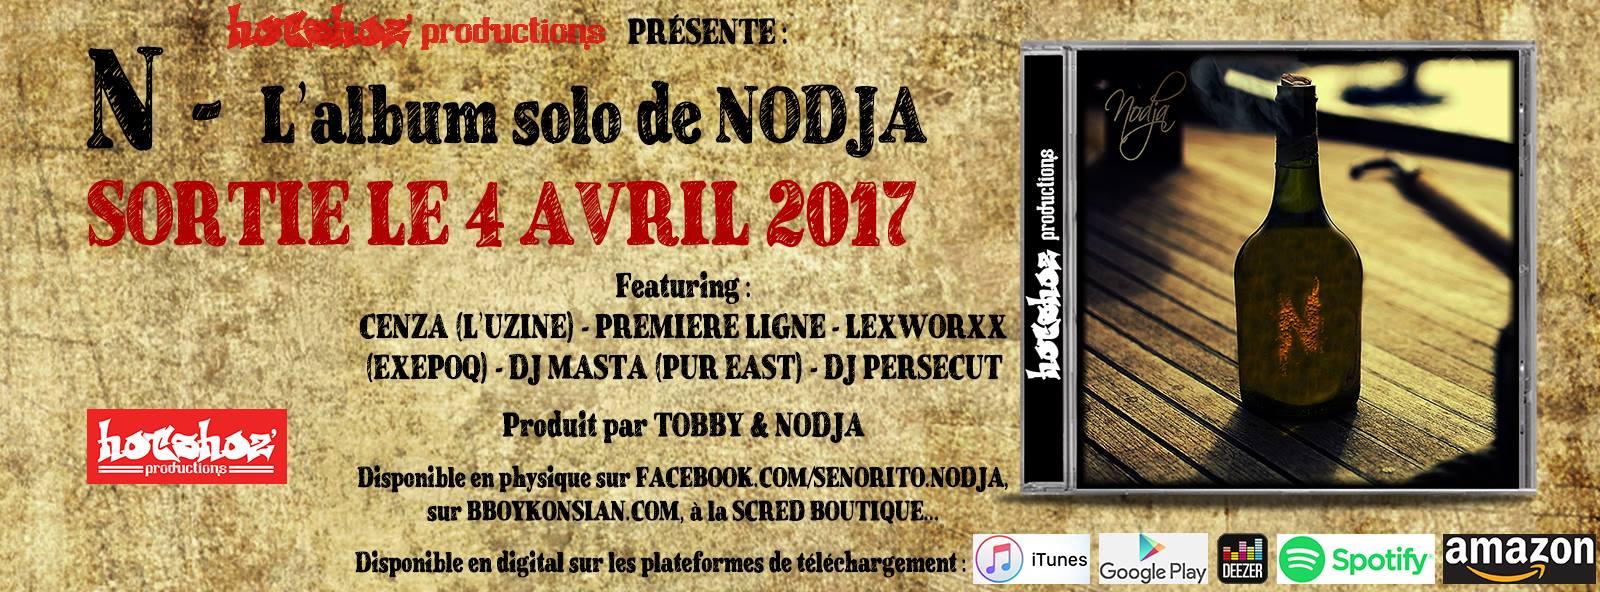 "Nouvel album de Nodja ""N"" disponible en CD et Digital"